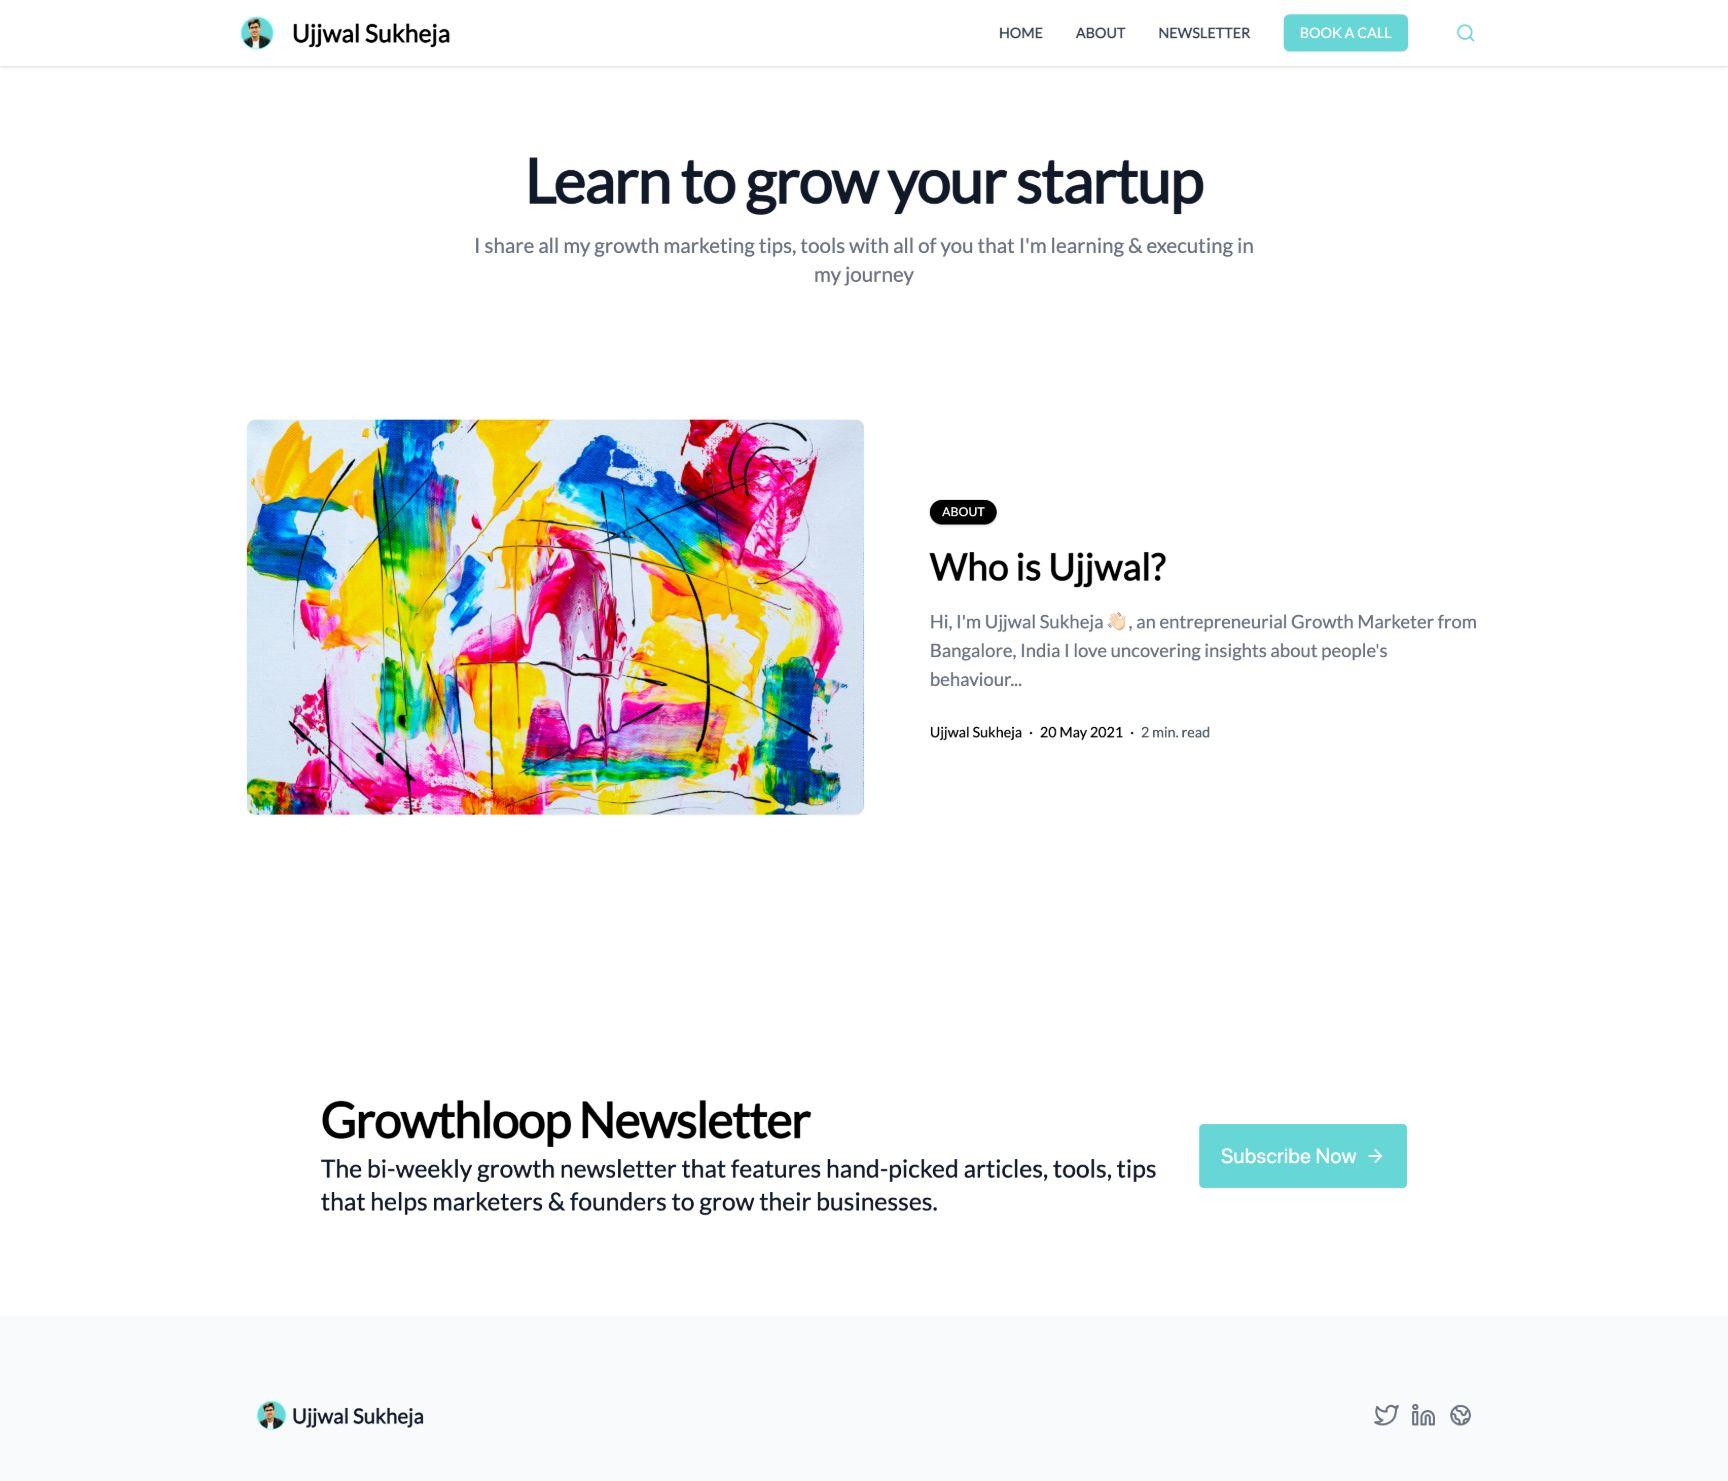 Ujjwalsukheja.com